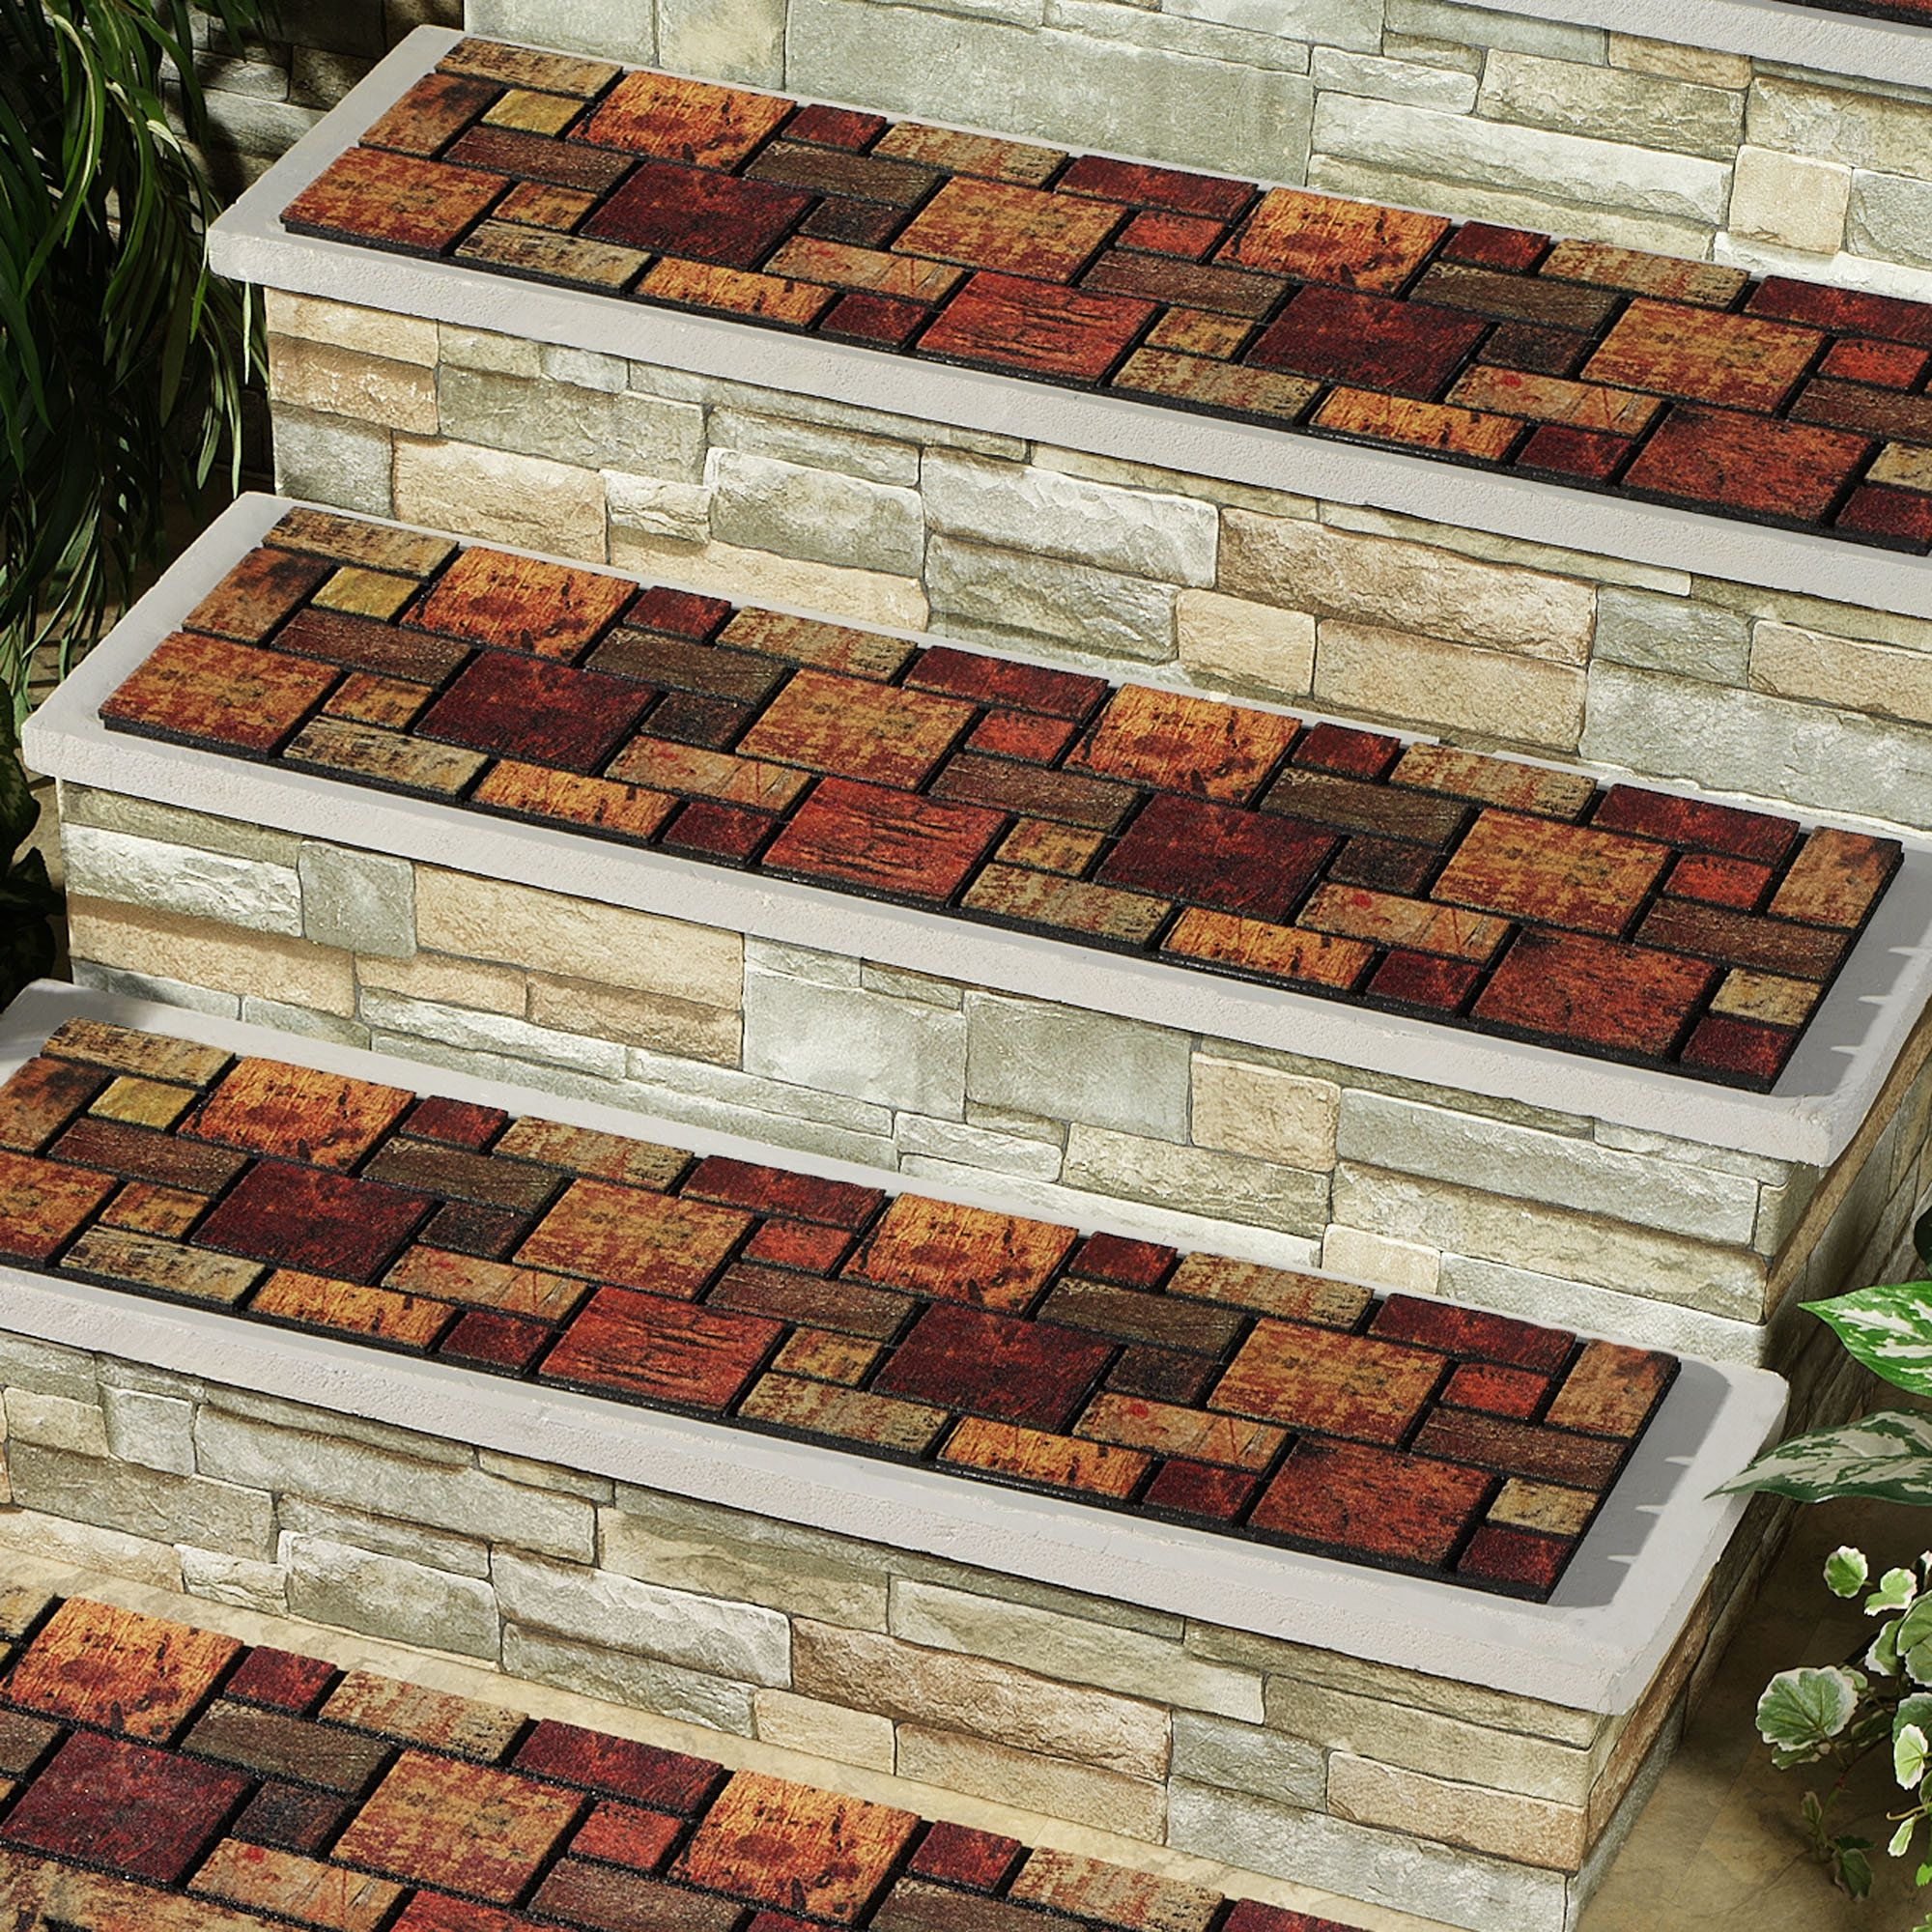 Decorative Outdoor Stair Treads Home Textured Blocks Stair Tread | Decorative Outdoor Stair Treads | Stone | Interior | Non Slip | Modern Exterior Stair | Fancy